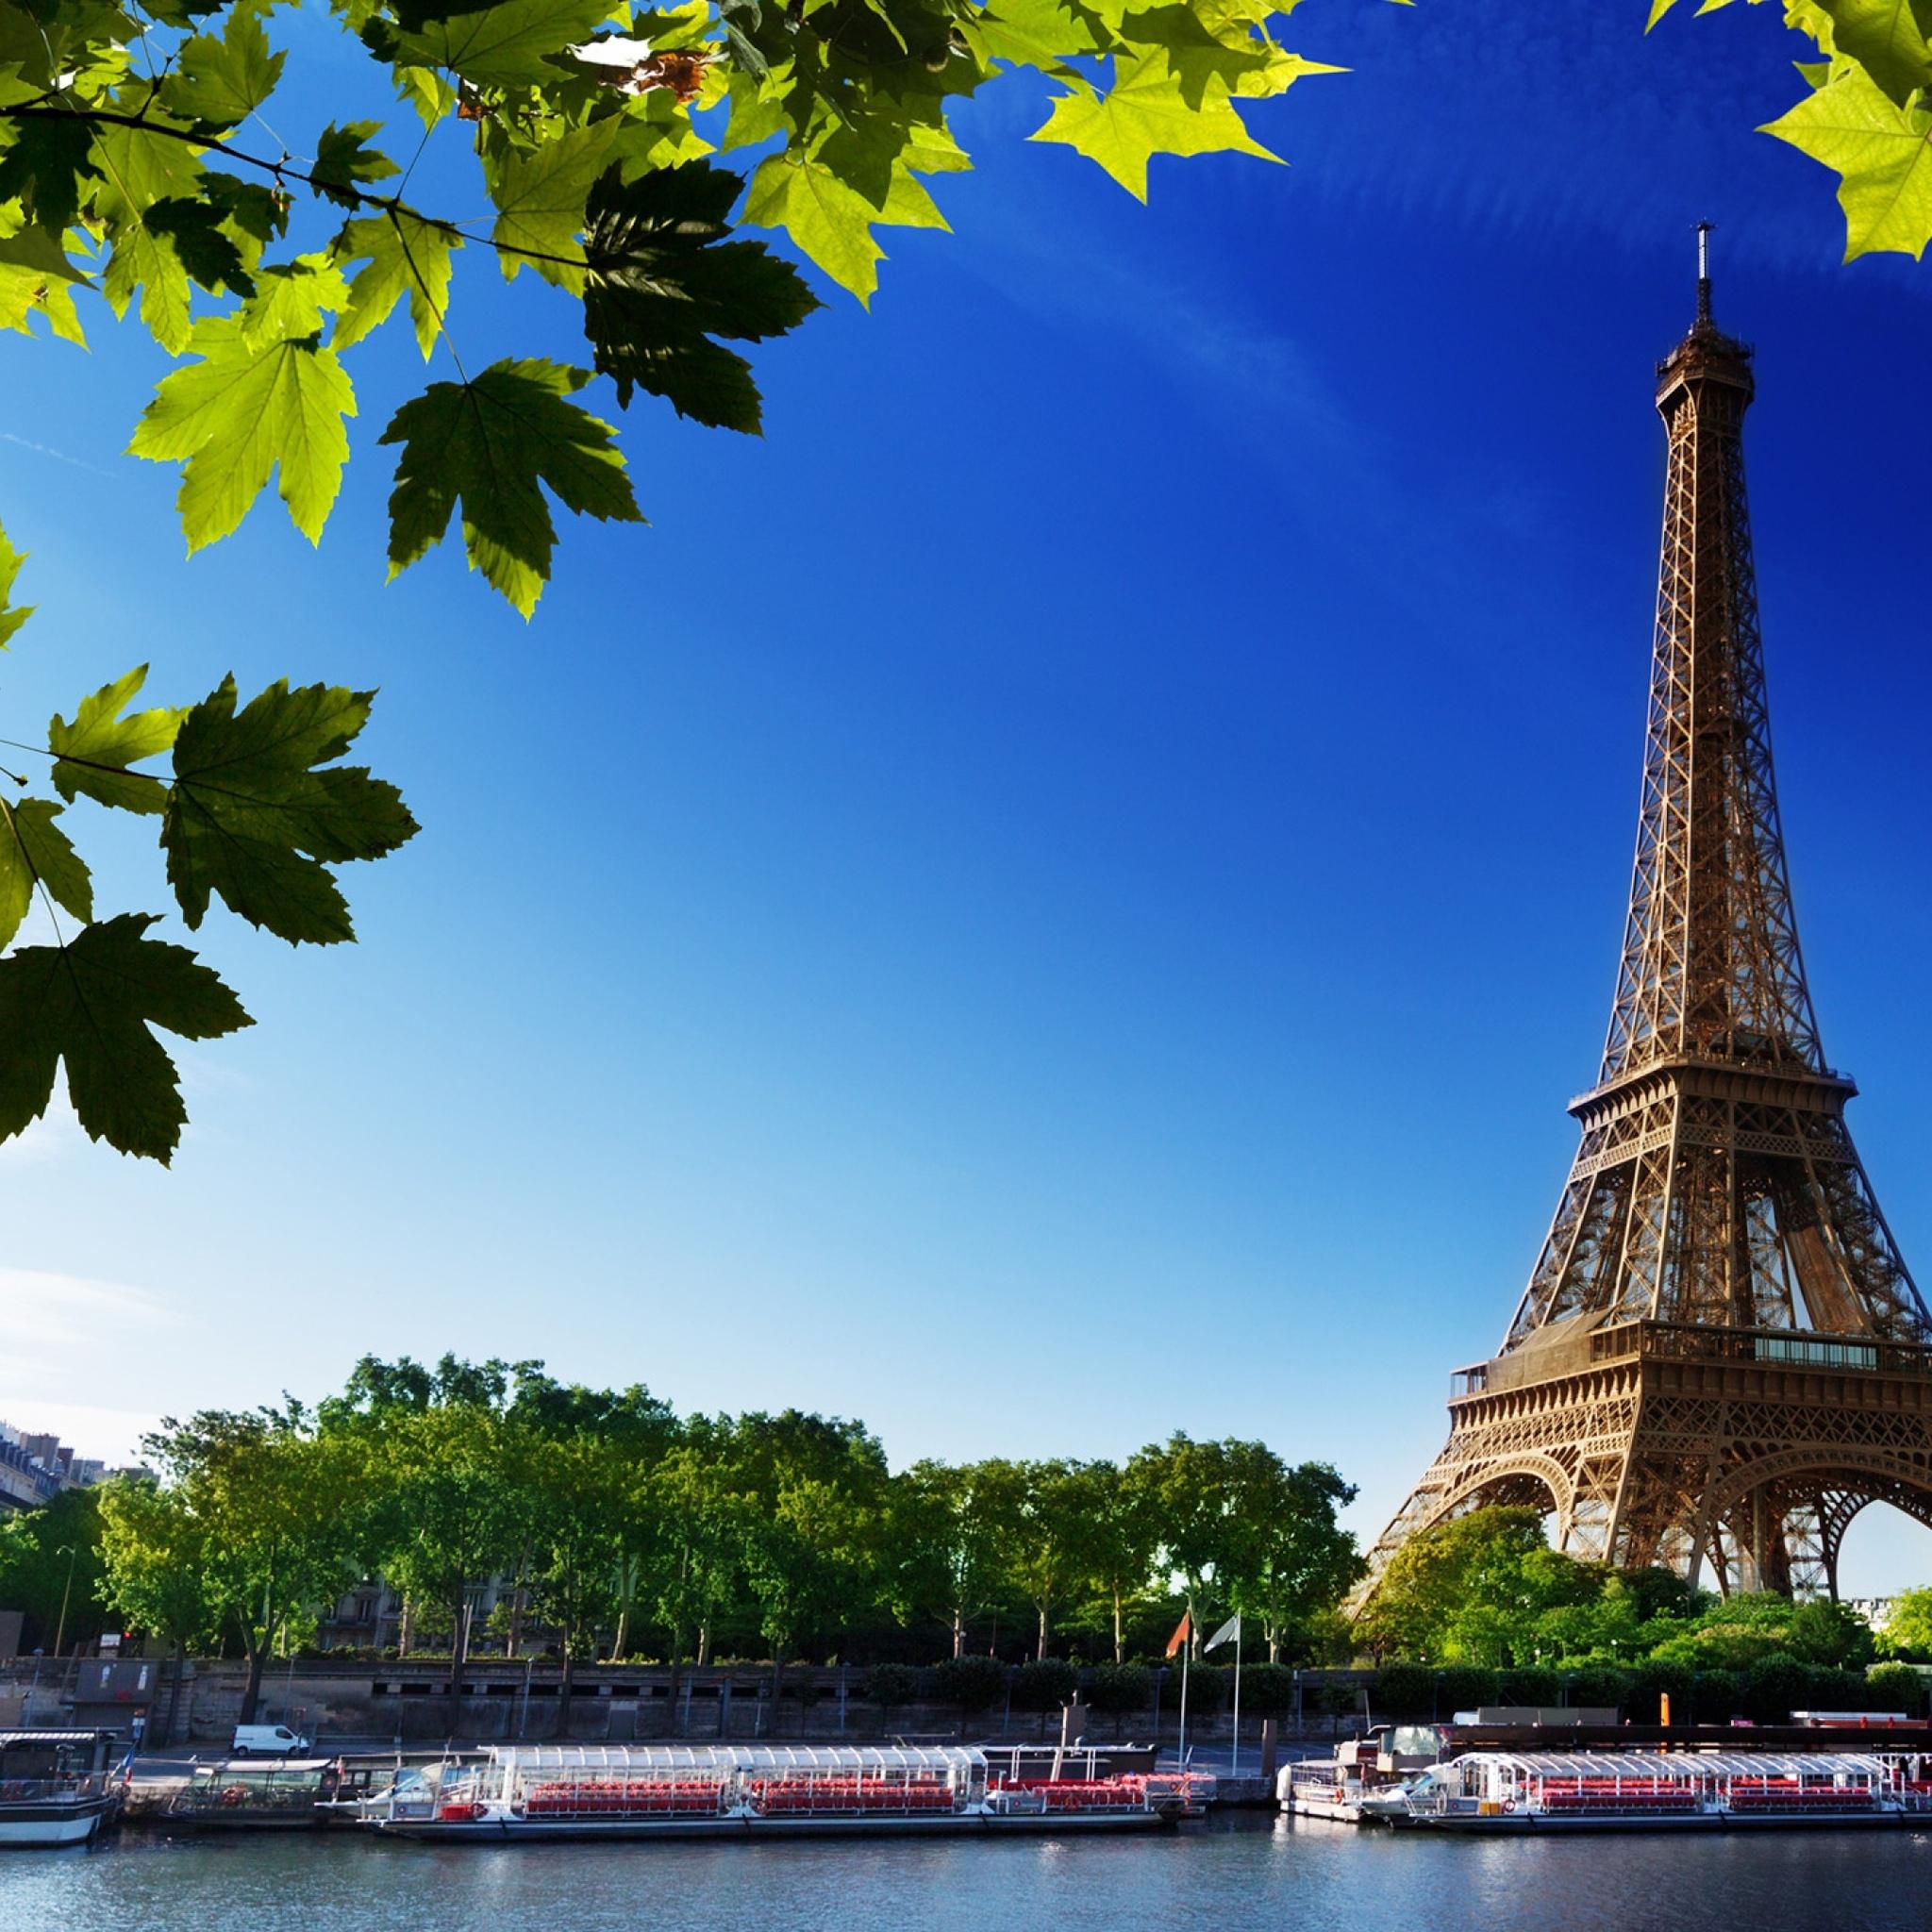 Download Wallpaper Eiffel Tower 4k HD  Cikimm.com